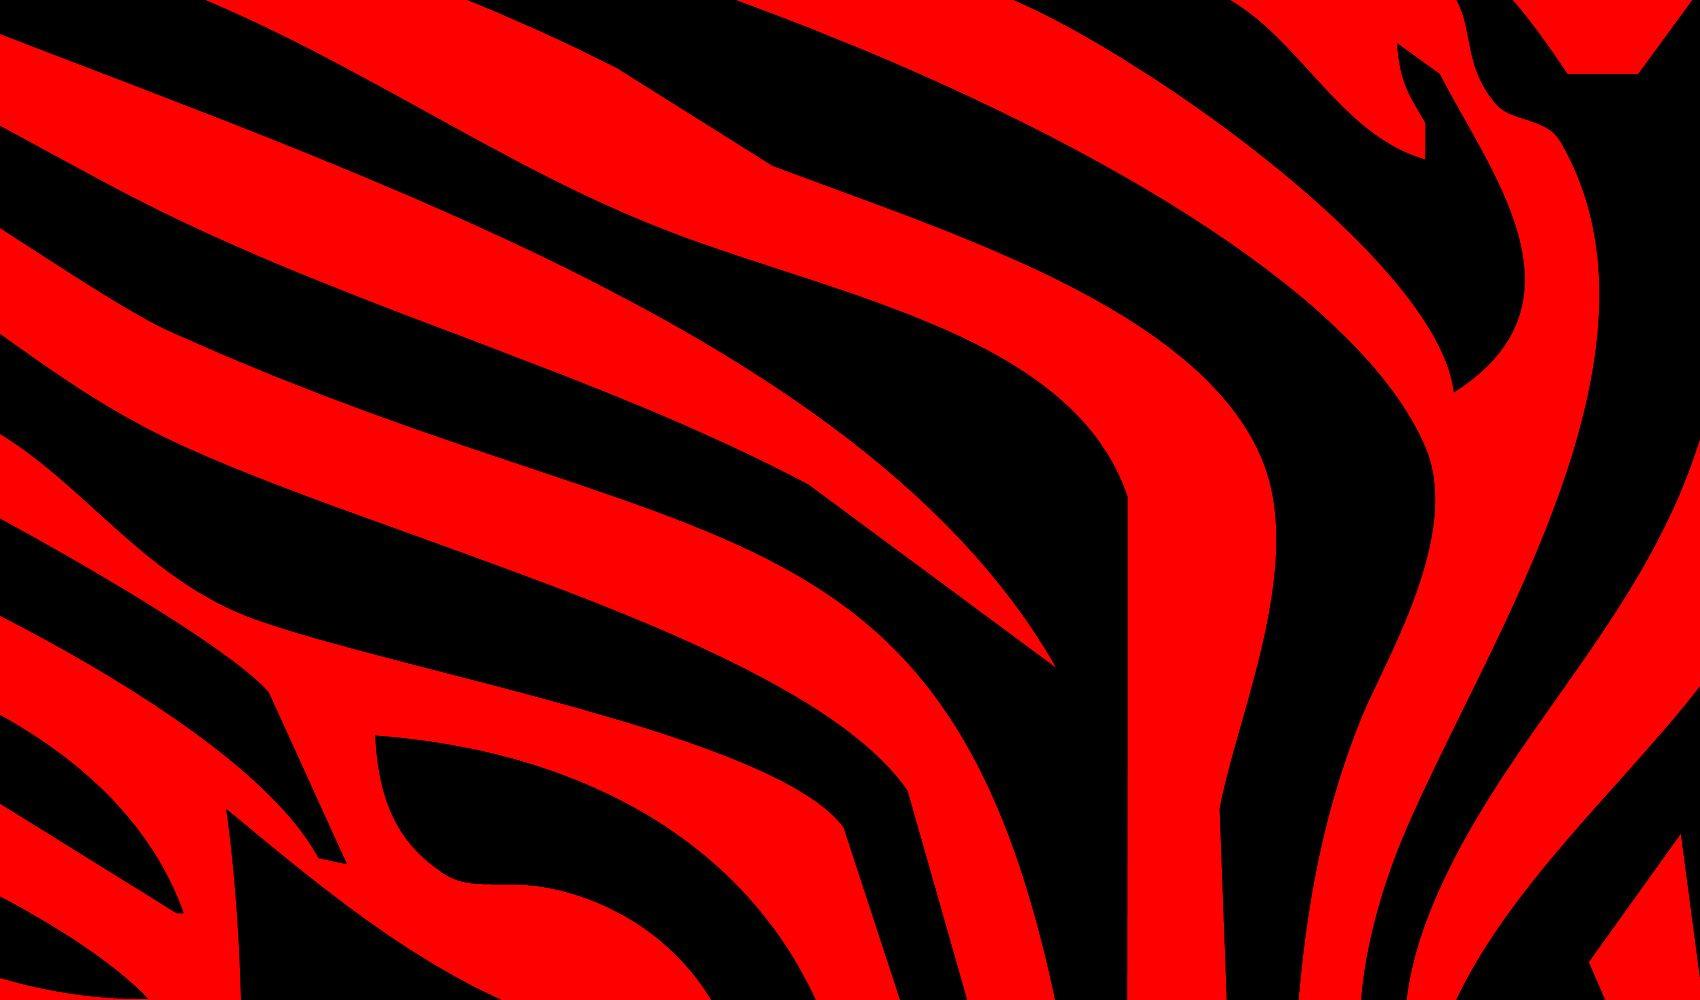 Red And Black Animal Print Wallpaper Zebra Print Wallpaper Animal Wallpaper